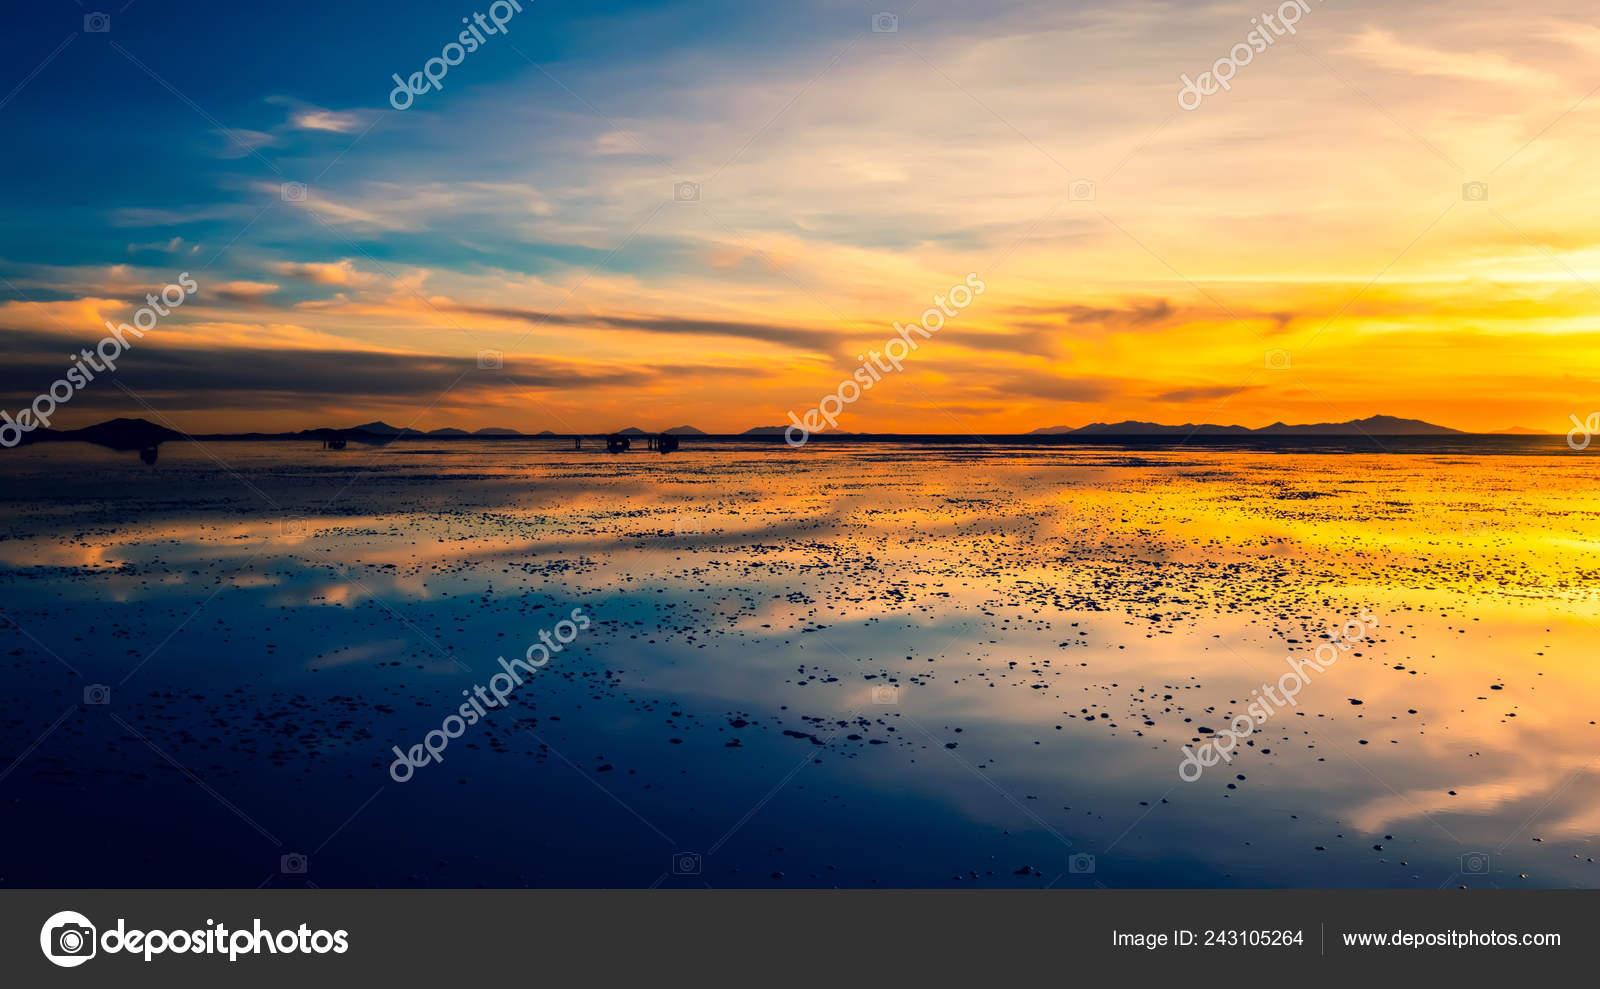 Evening Landscape Of Salar De Uyuni Sunset Stock Photo